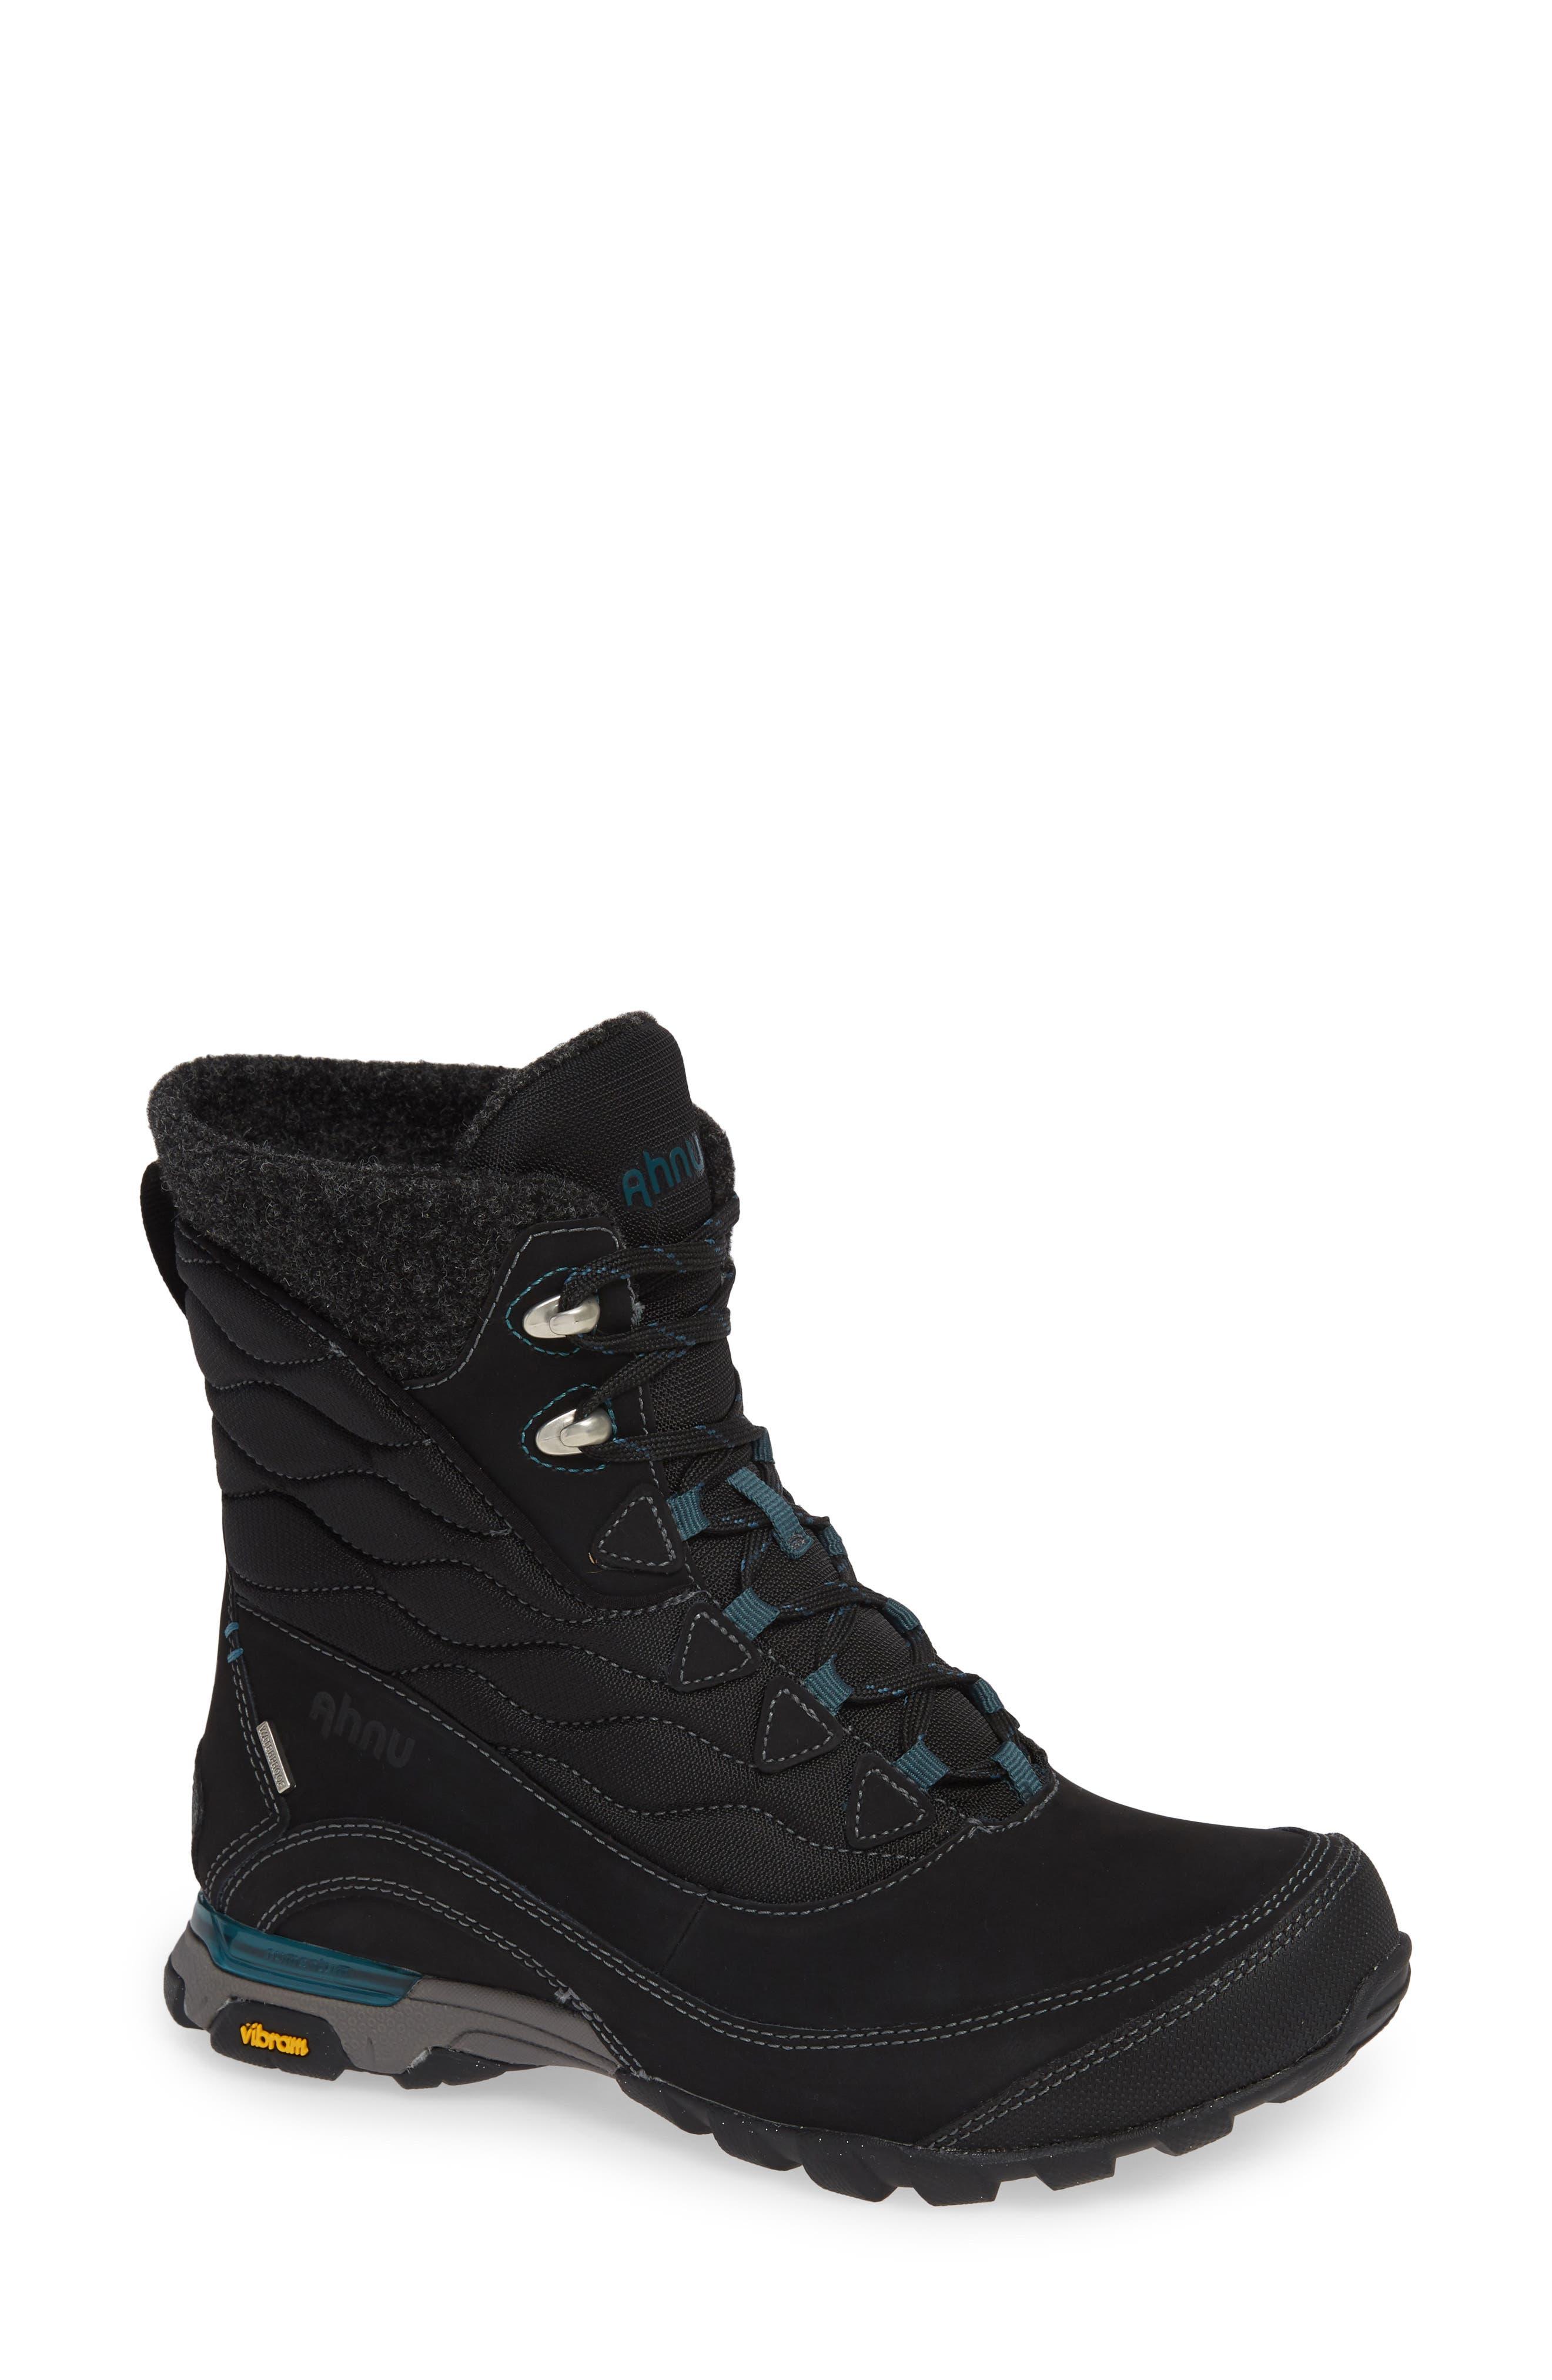 TEVA Ahnu by Teva Sugarfrost Insulated Waterproof Boot, Main, color, BLACK LEATHER